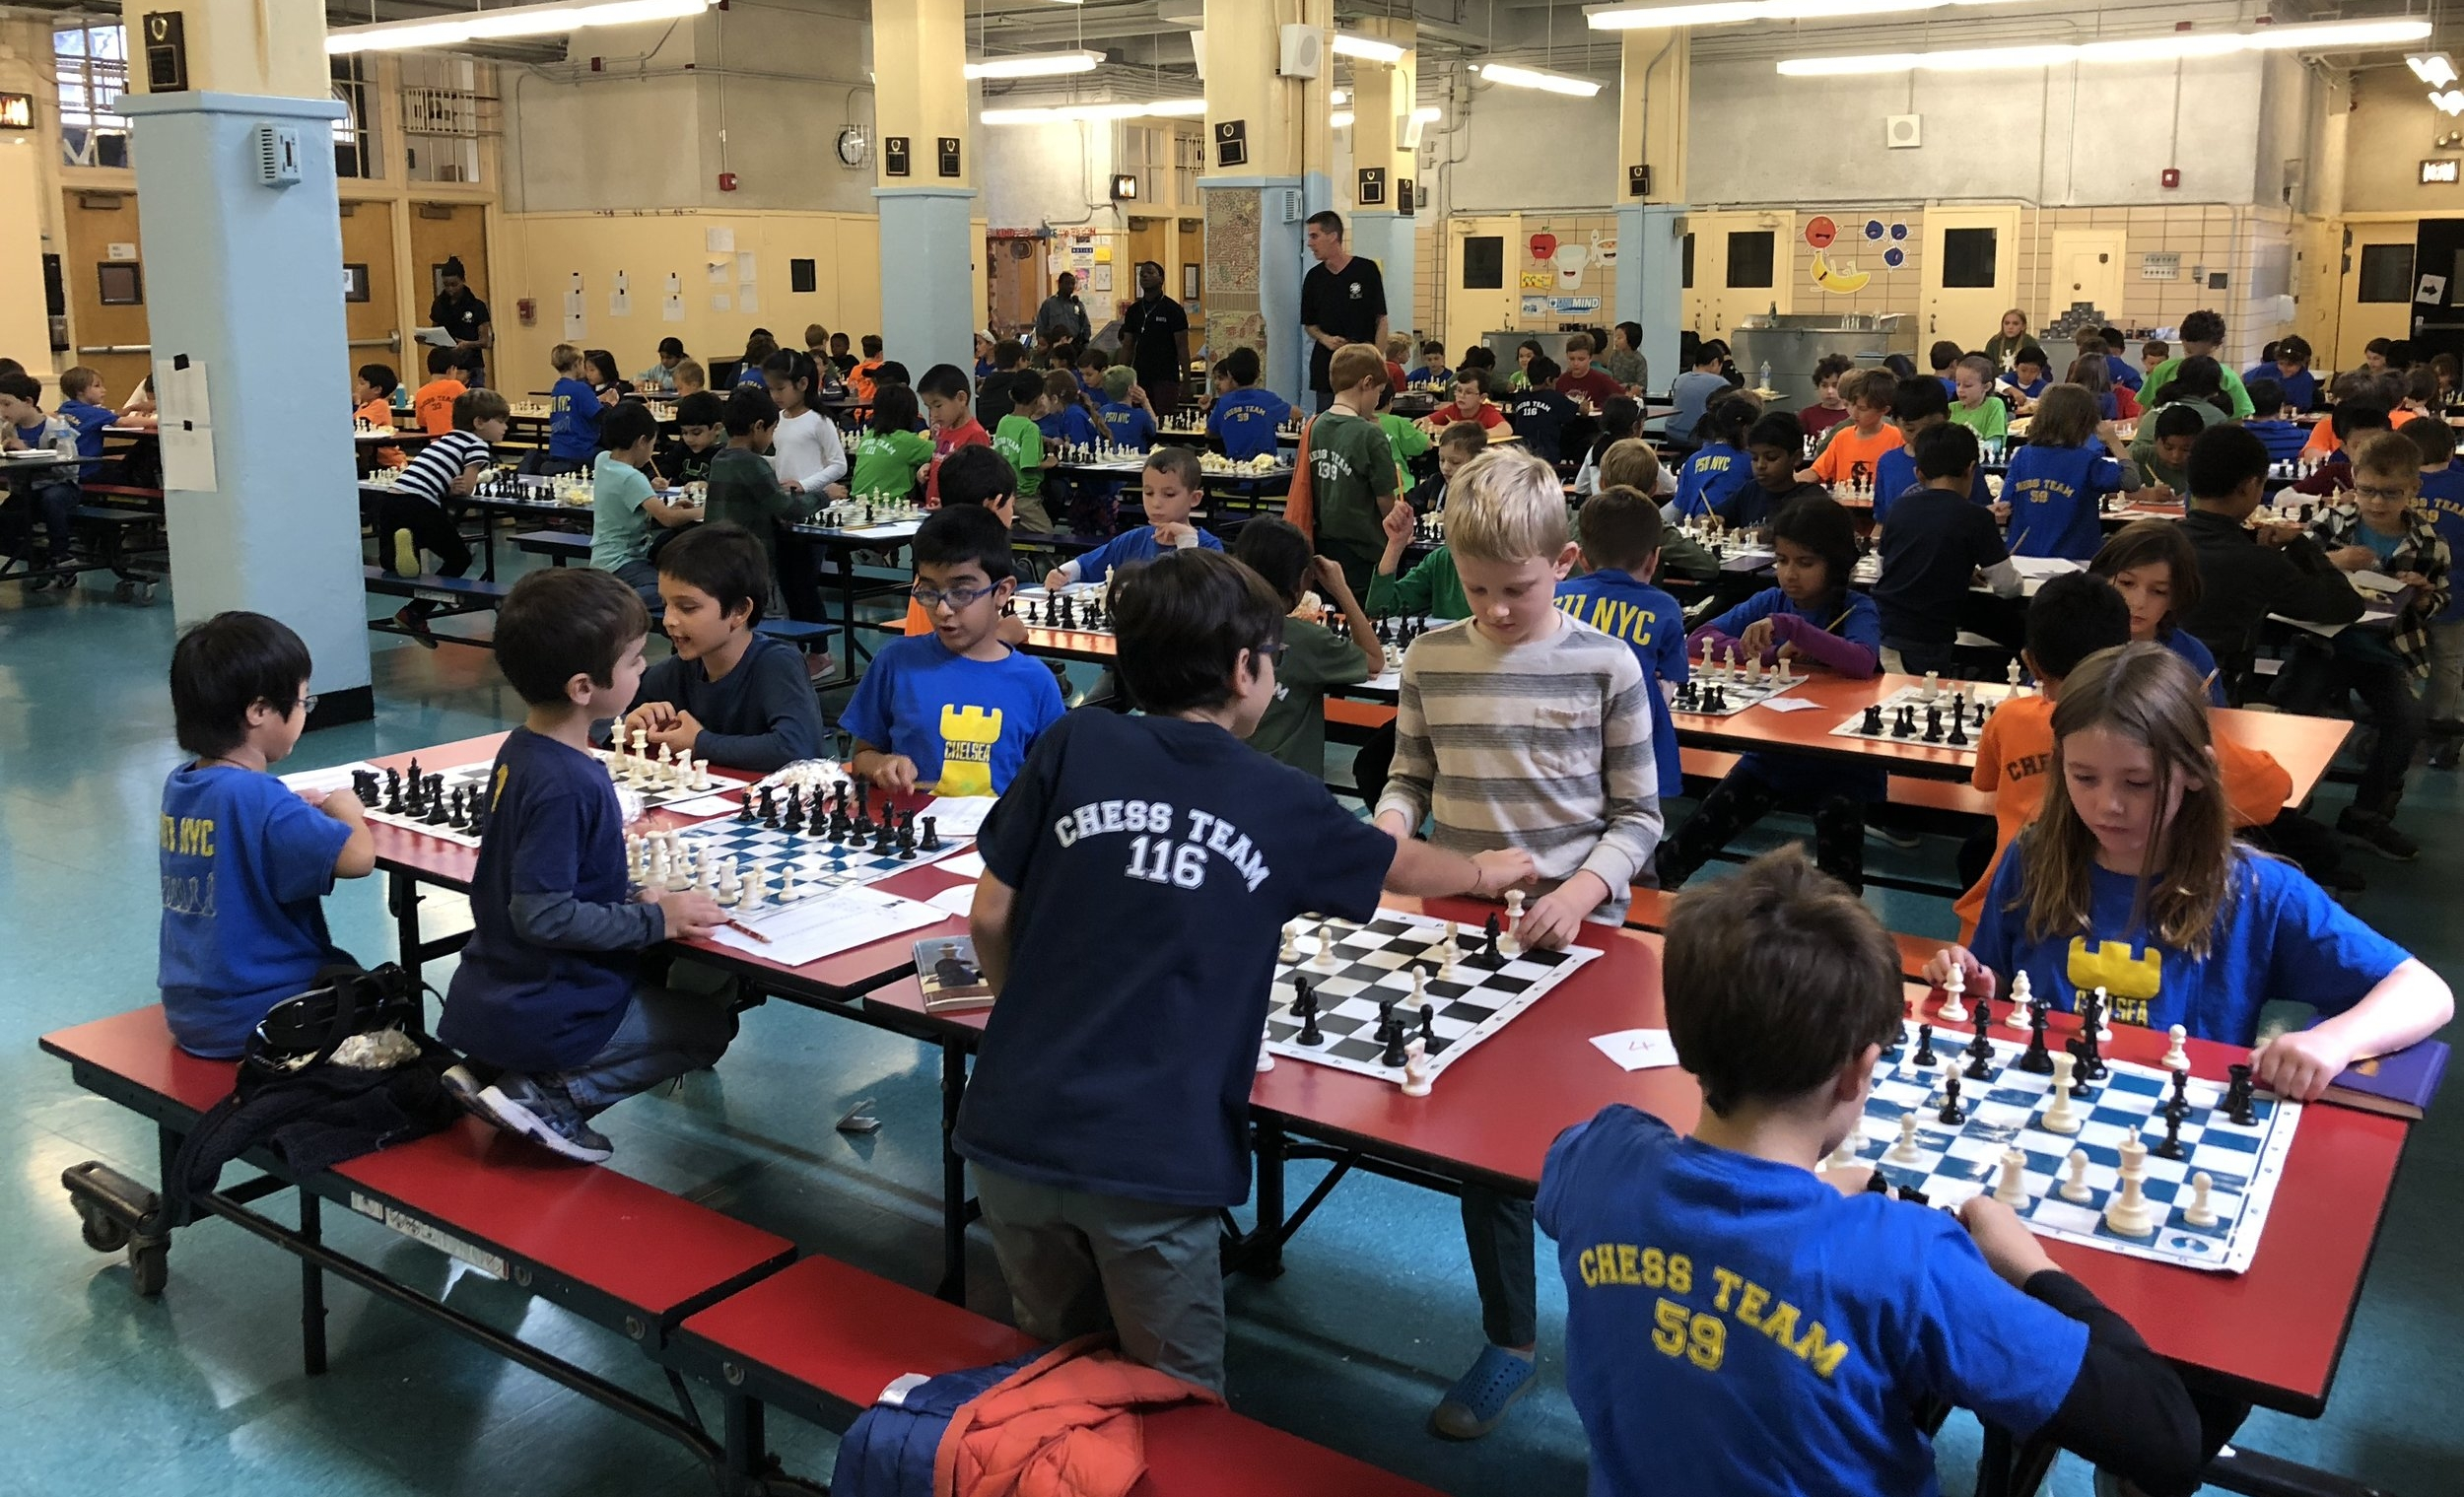 PS 11 Chess Tournament